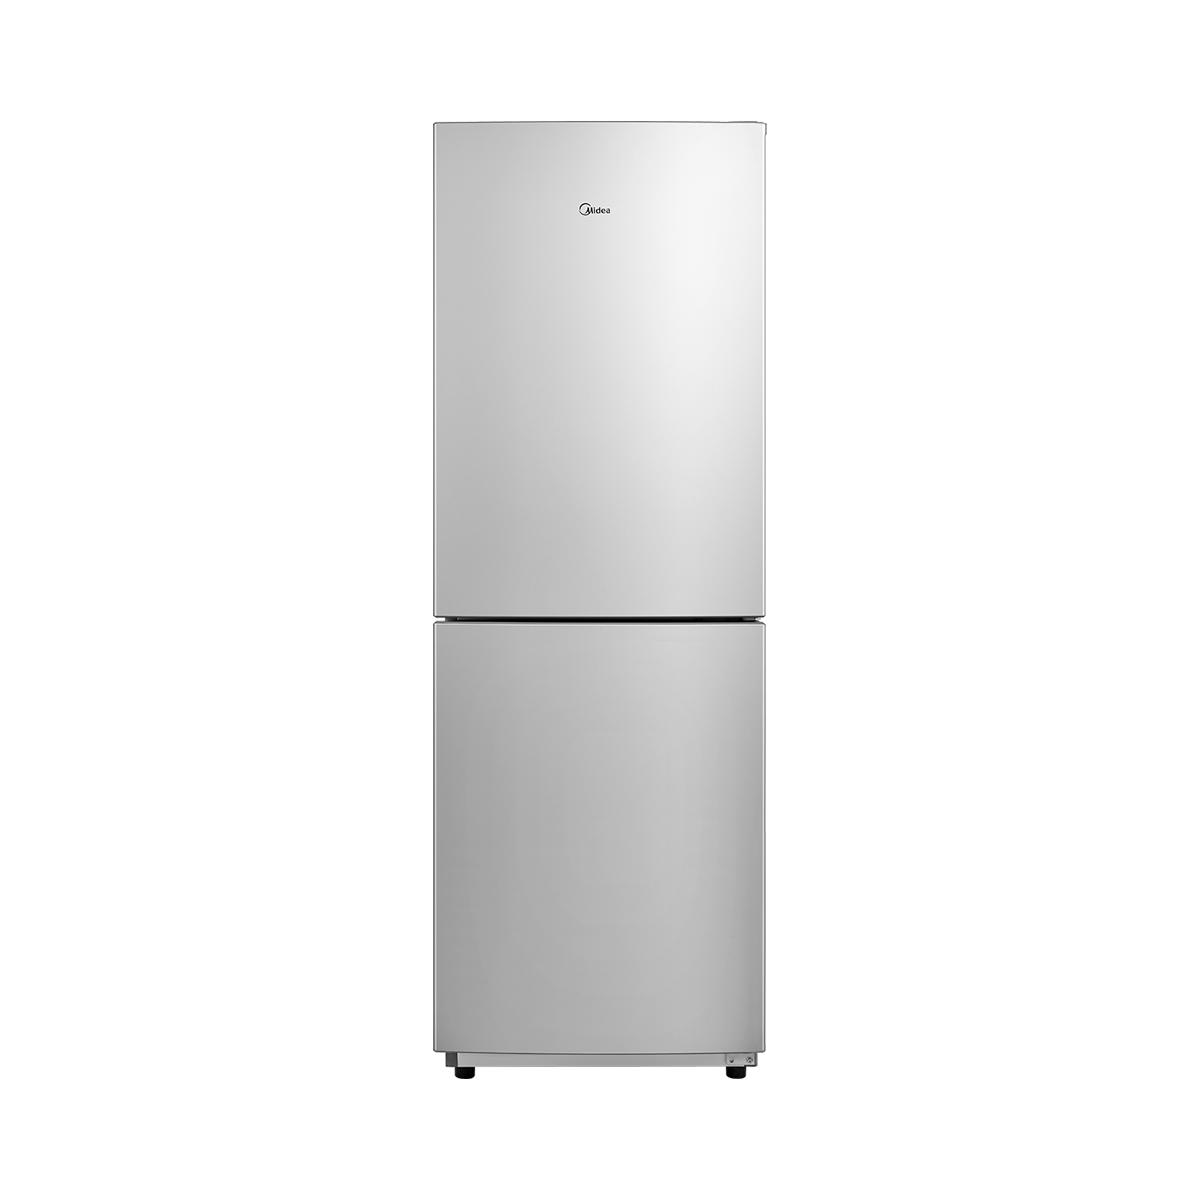 Midea/美的 BCD-195M(ZG)冰箱 说明书.pdf